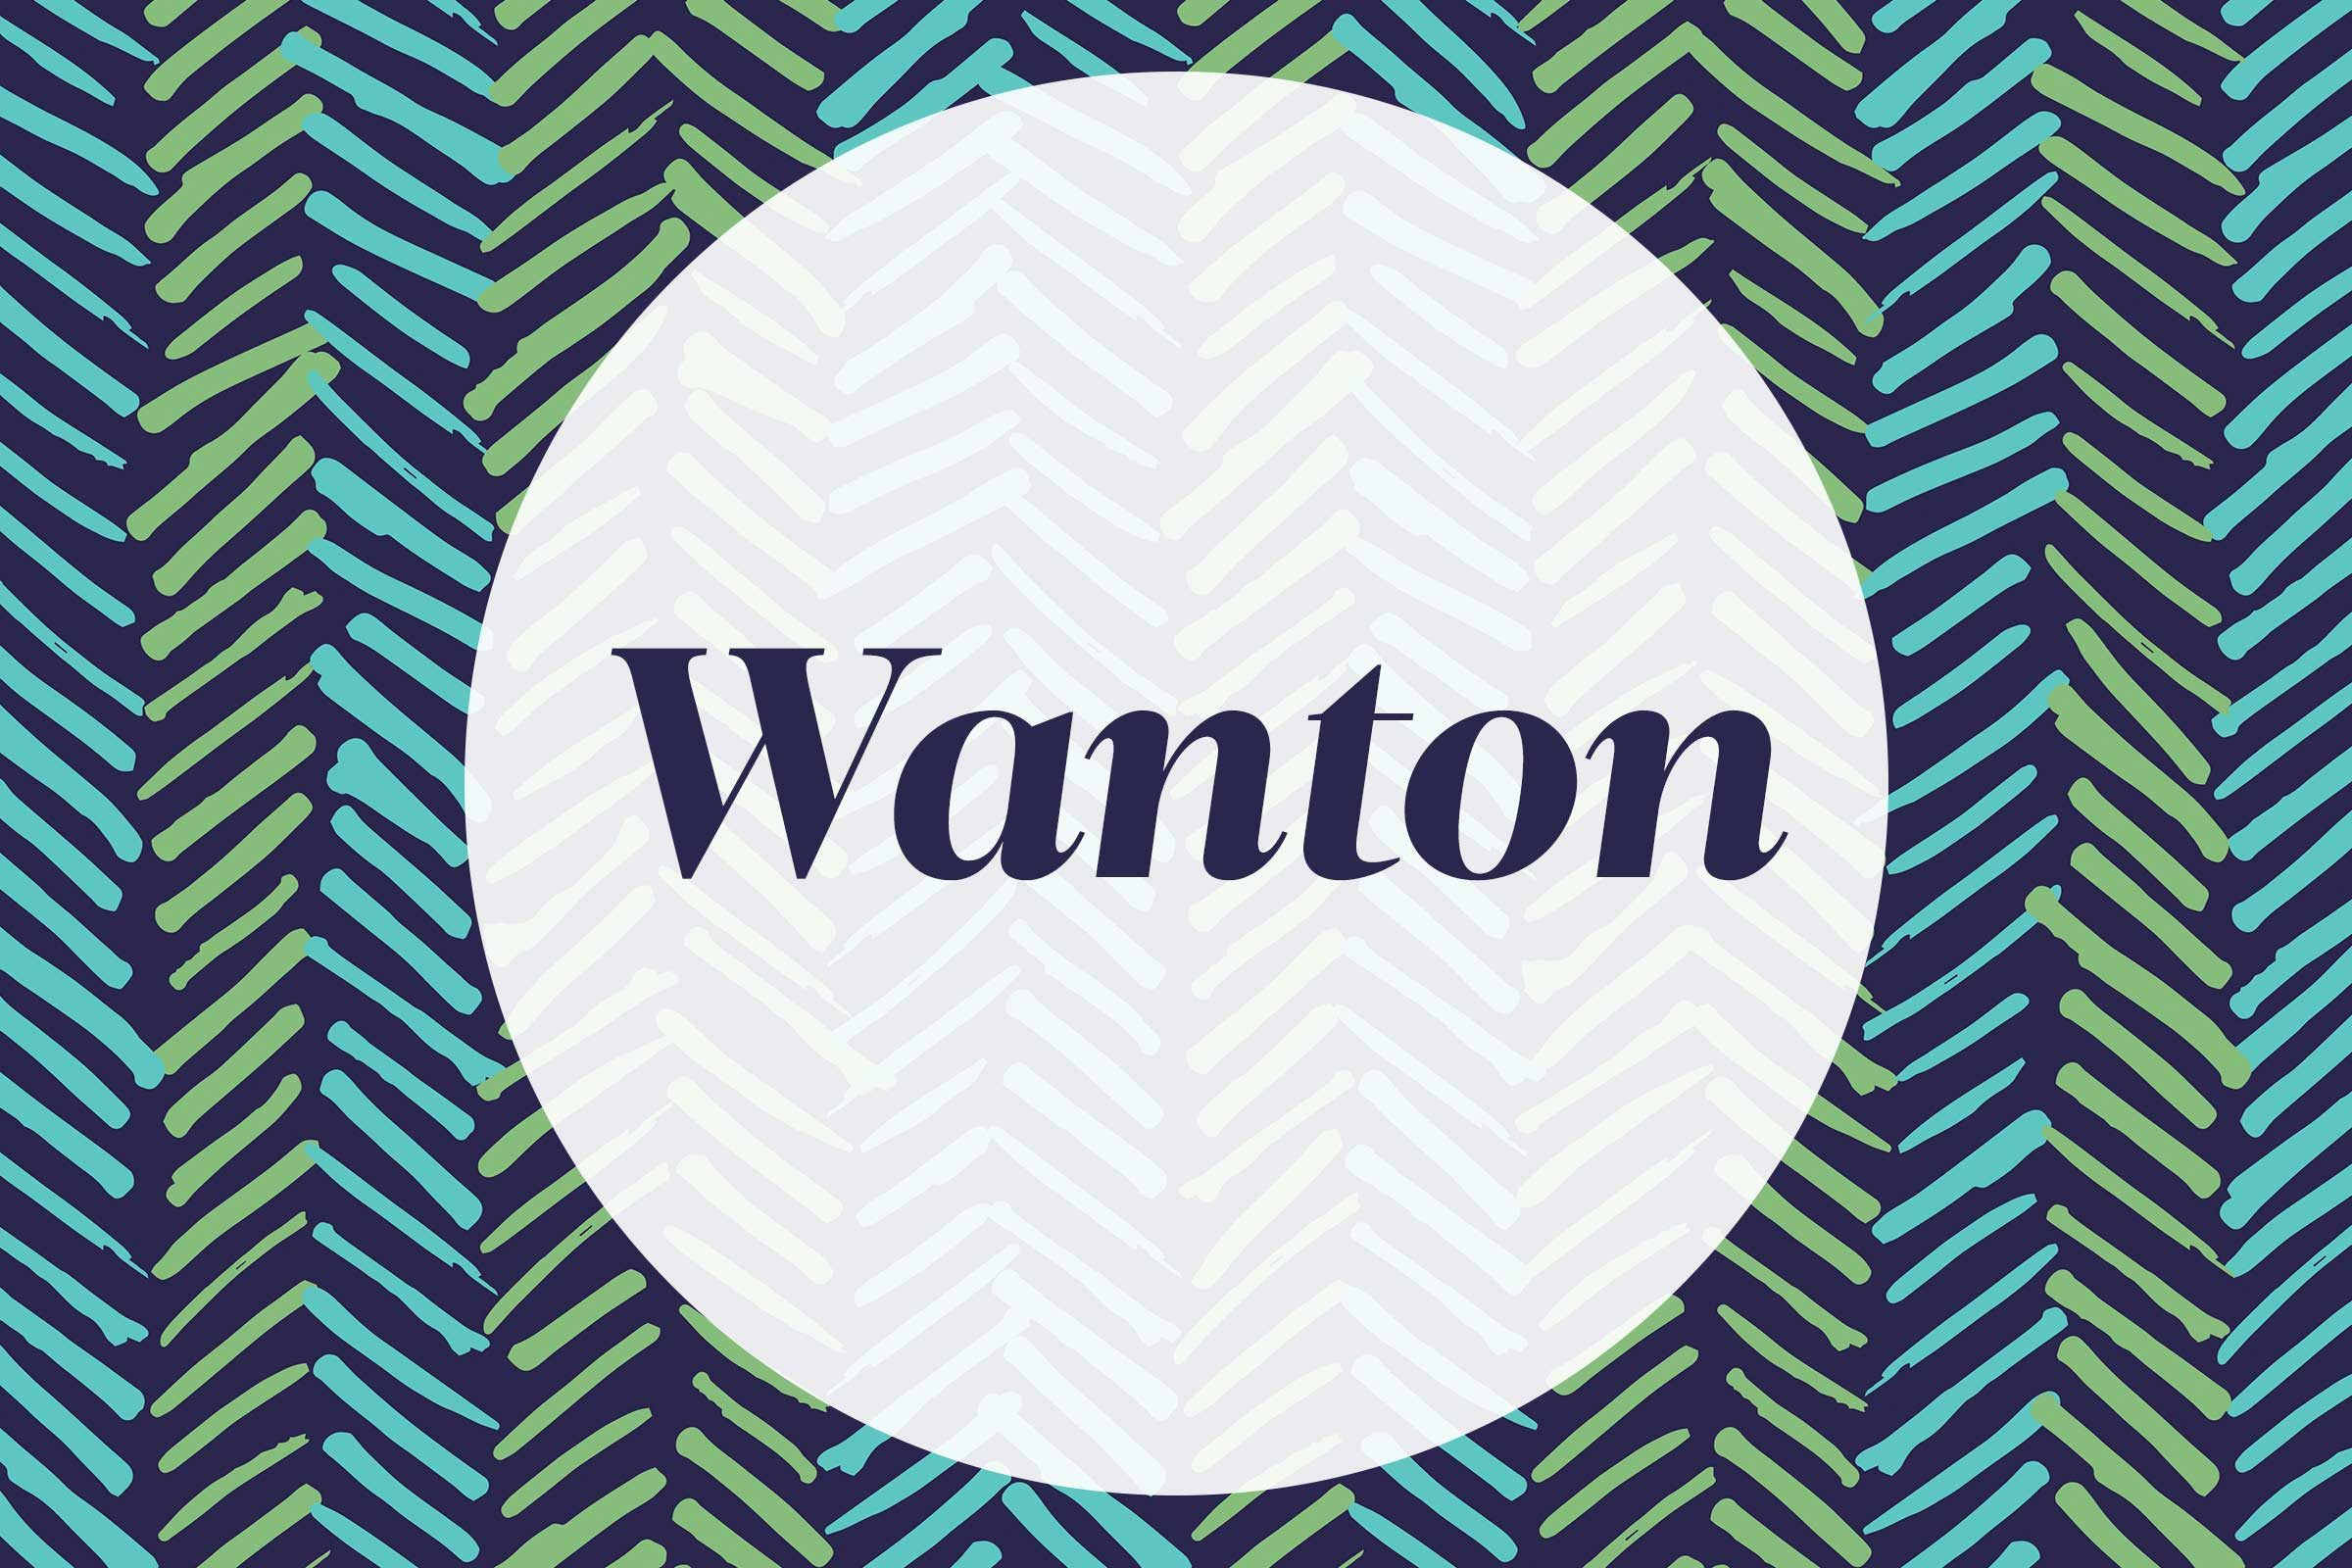 01-wanton-middle-school-vocab-words